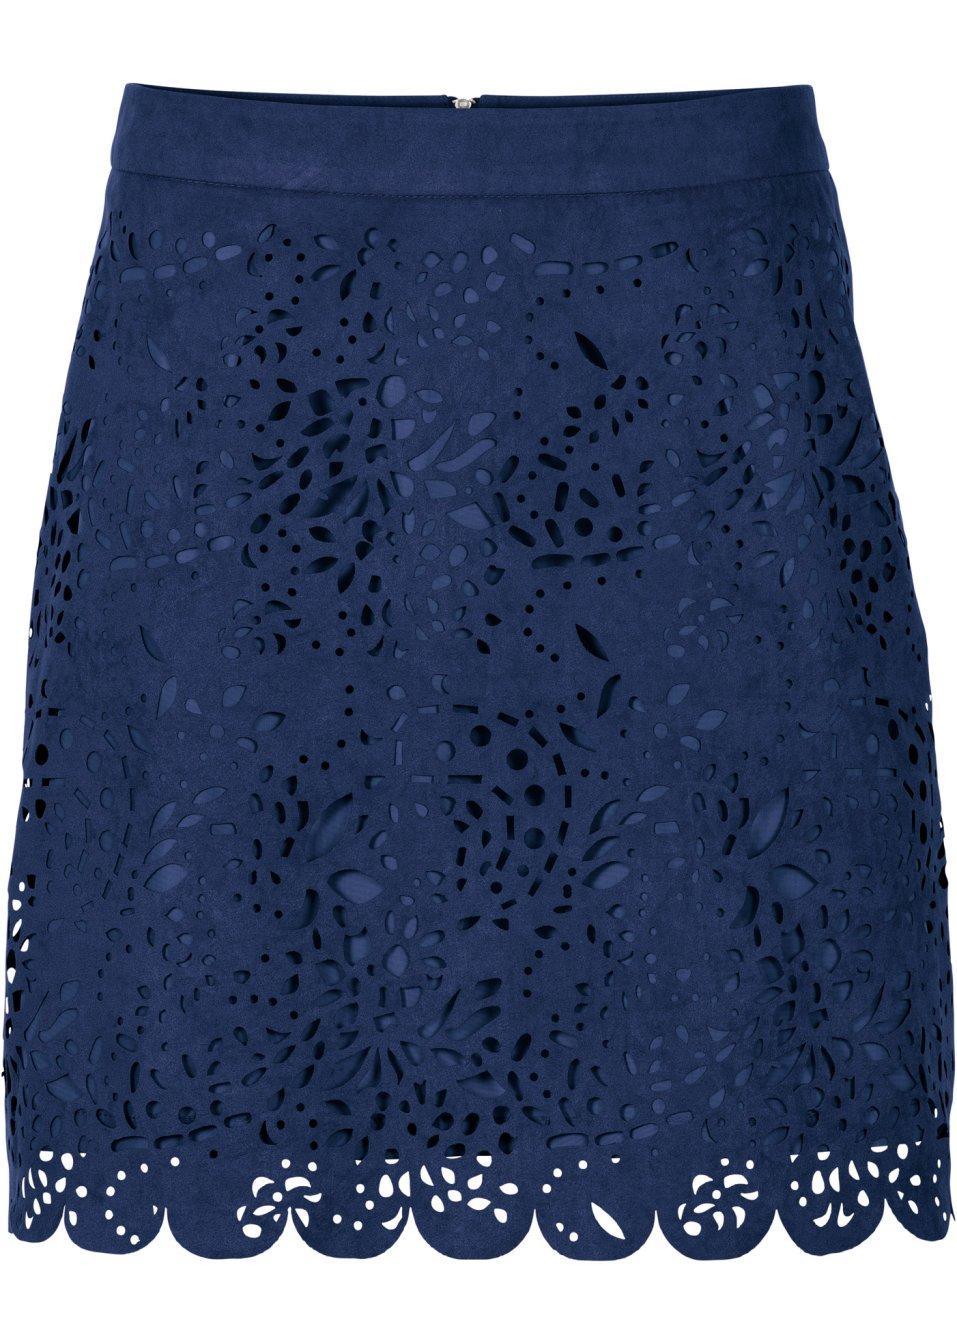 mini jupe en synth tique imitation cuir velours bleu fonc bodyflirt. Black Bedroom Furniture Sets. Home Design Ideas